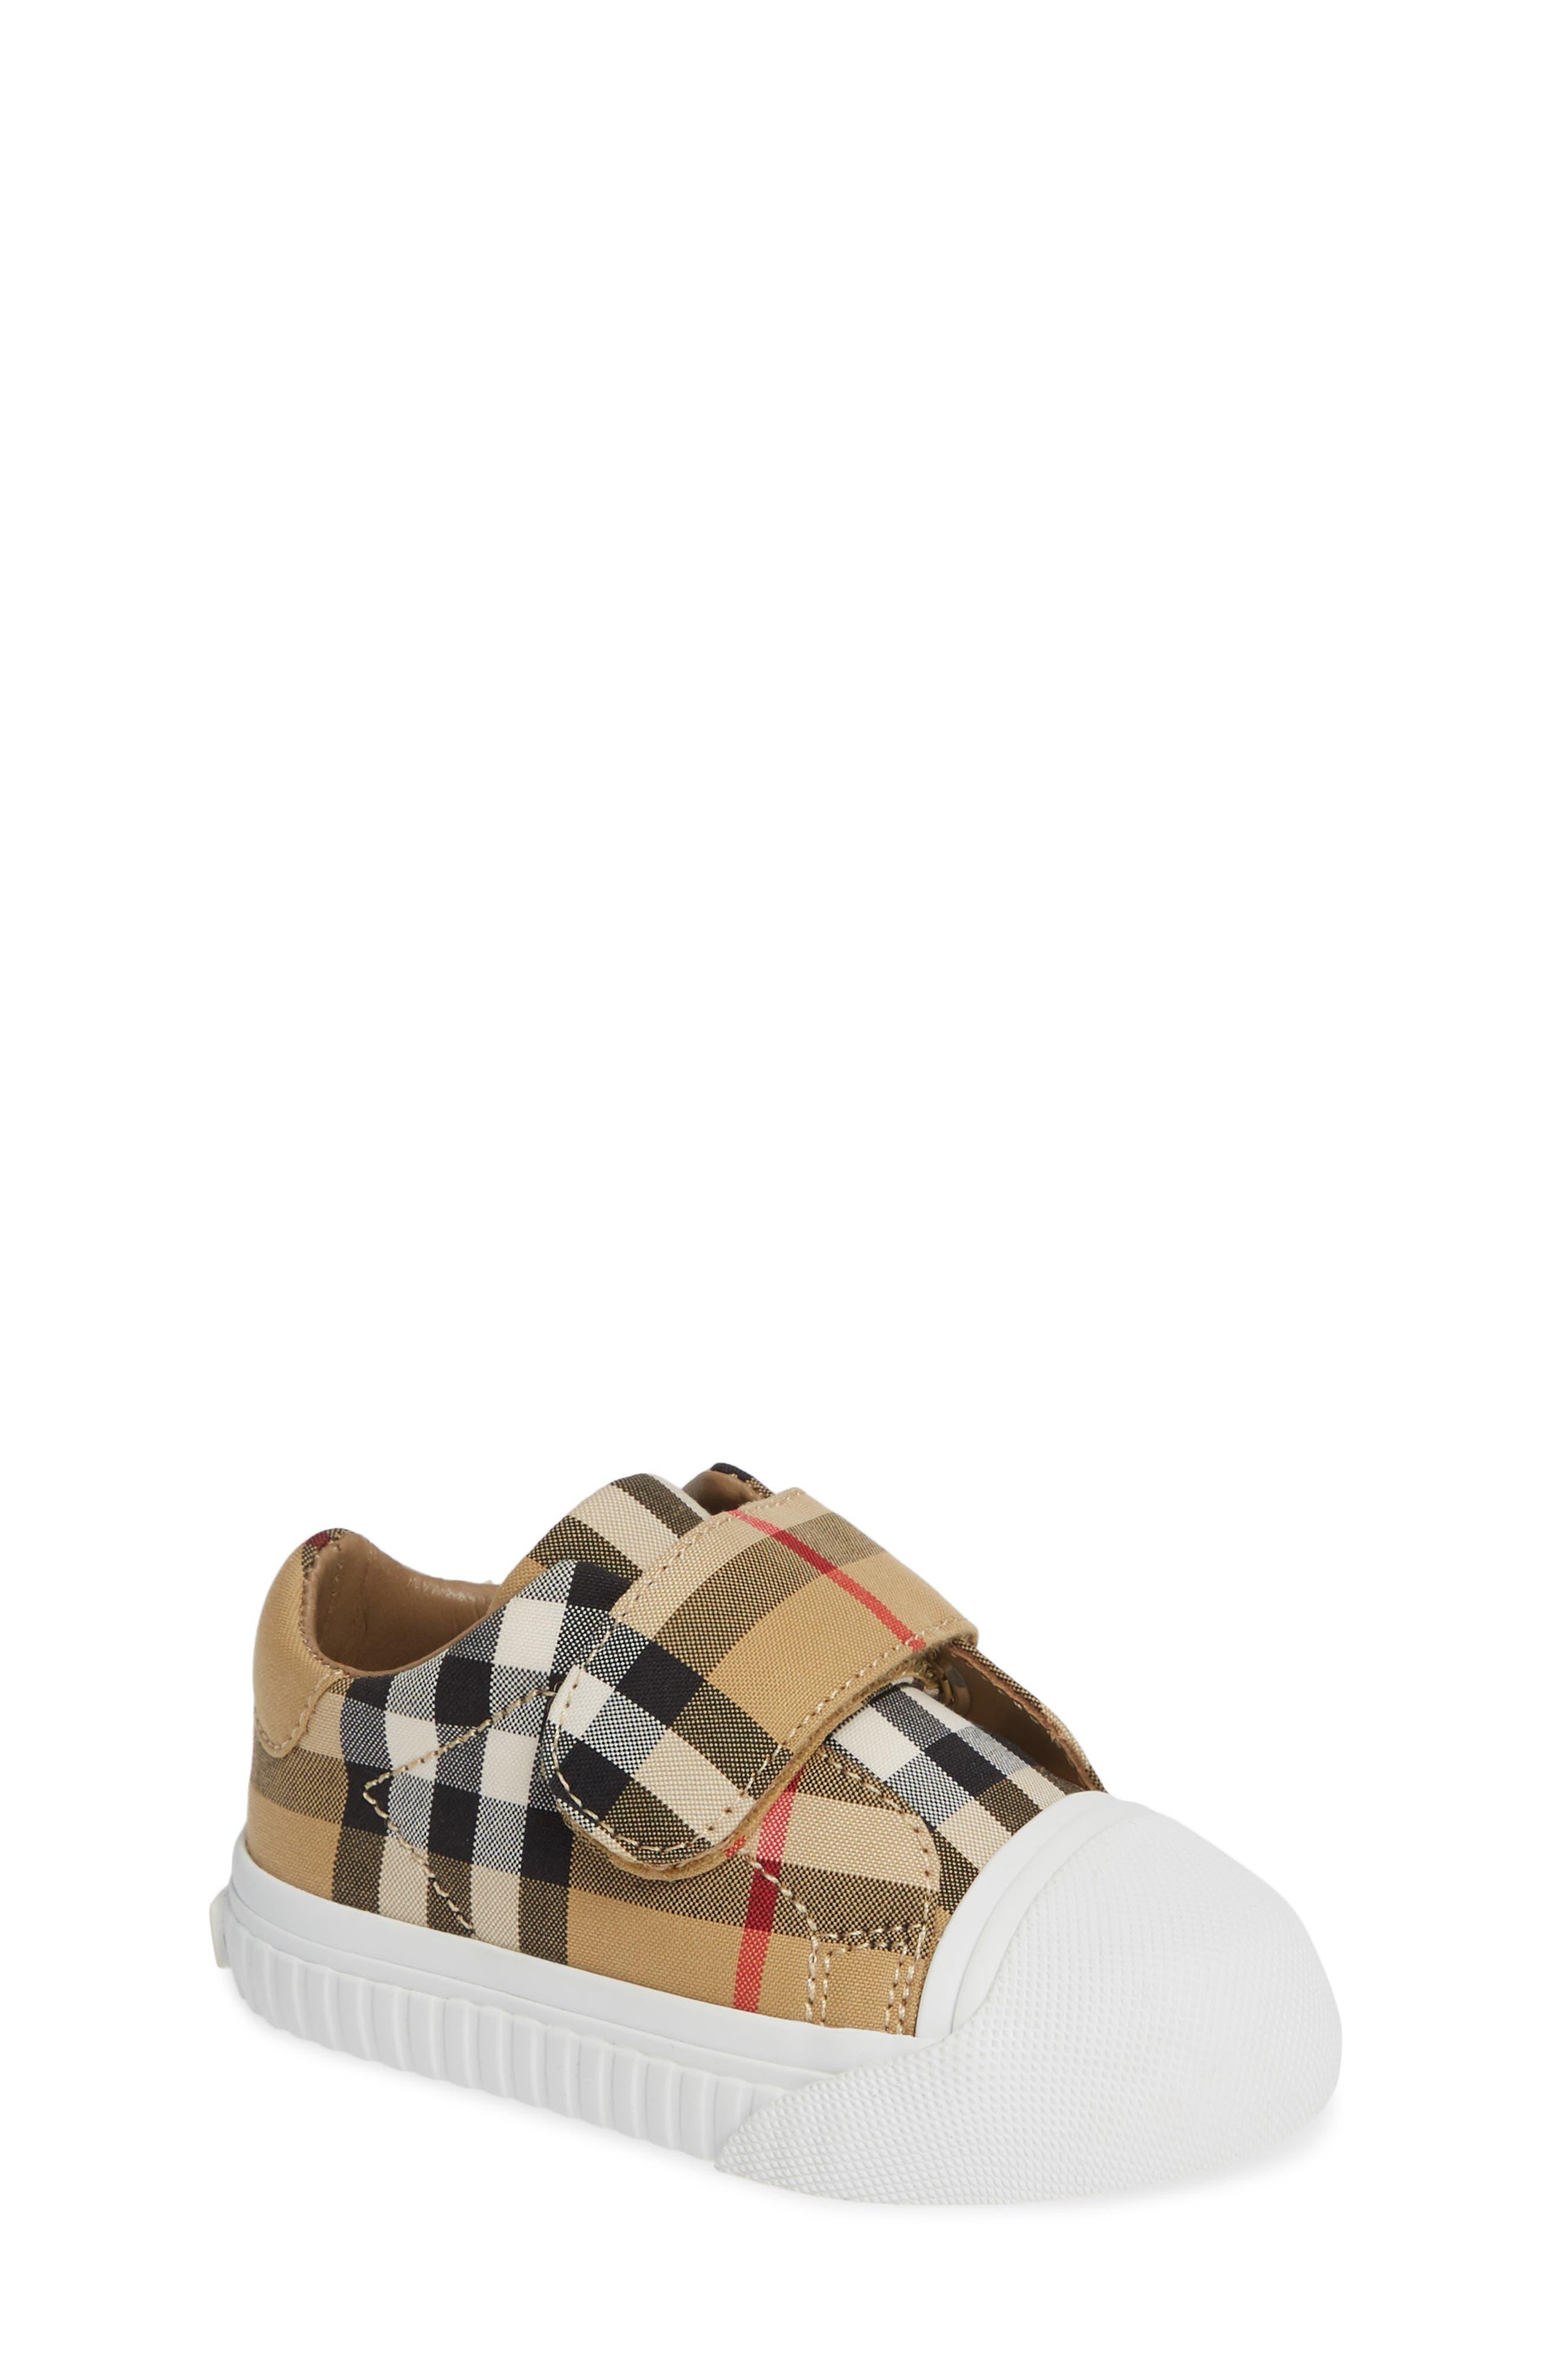 Burberry Beech Check Sneaker